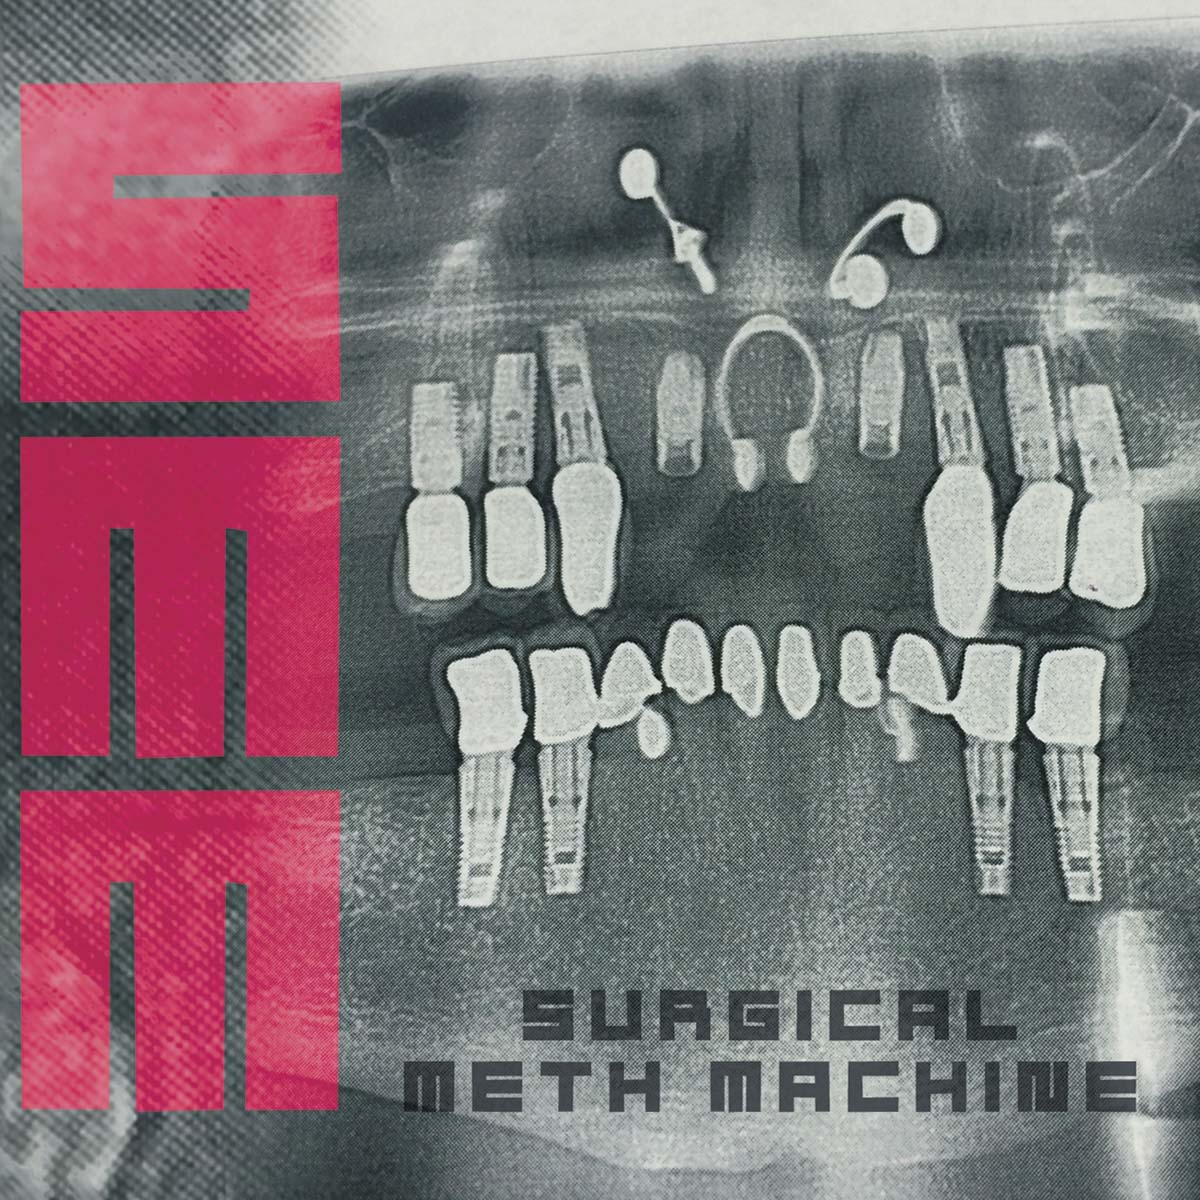 Surgical Meth Machine - Surgical Meth Machine - Artwork